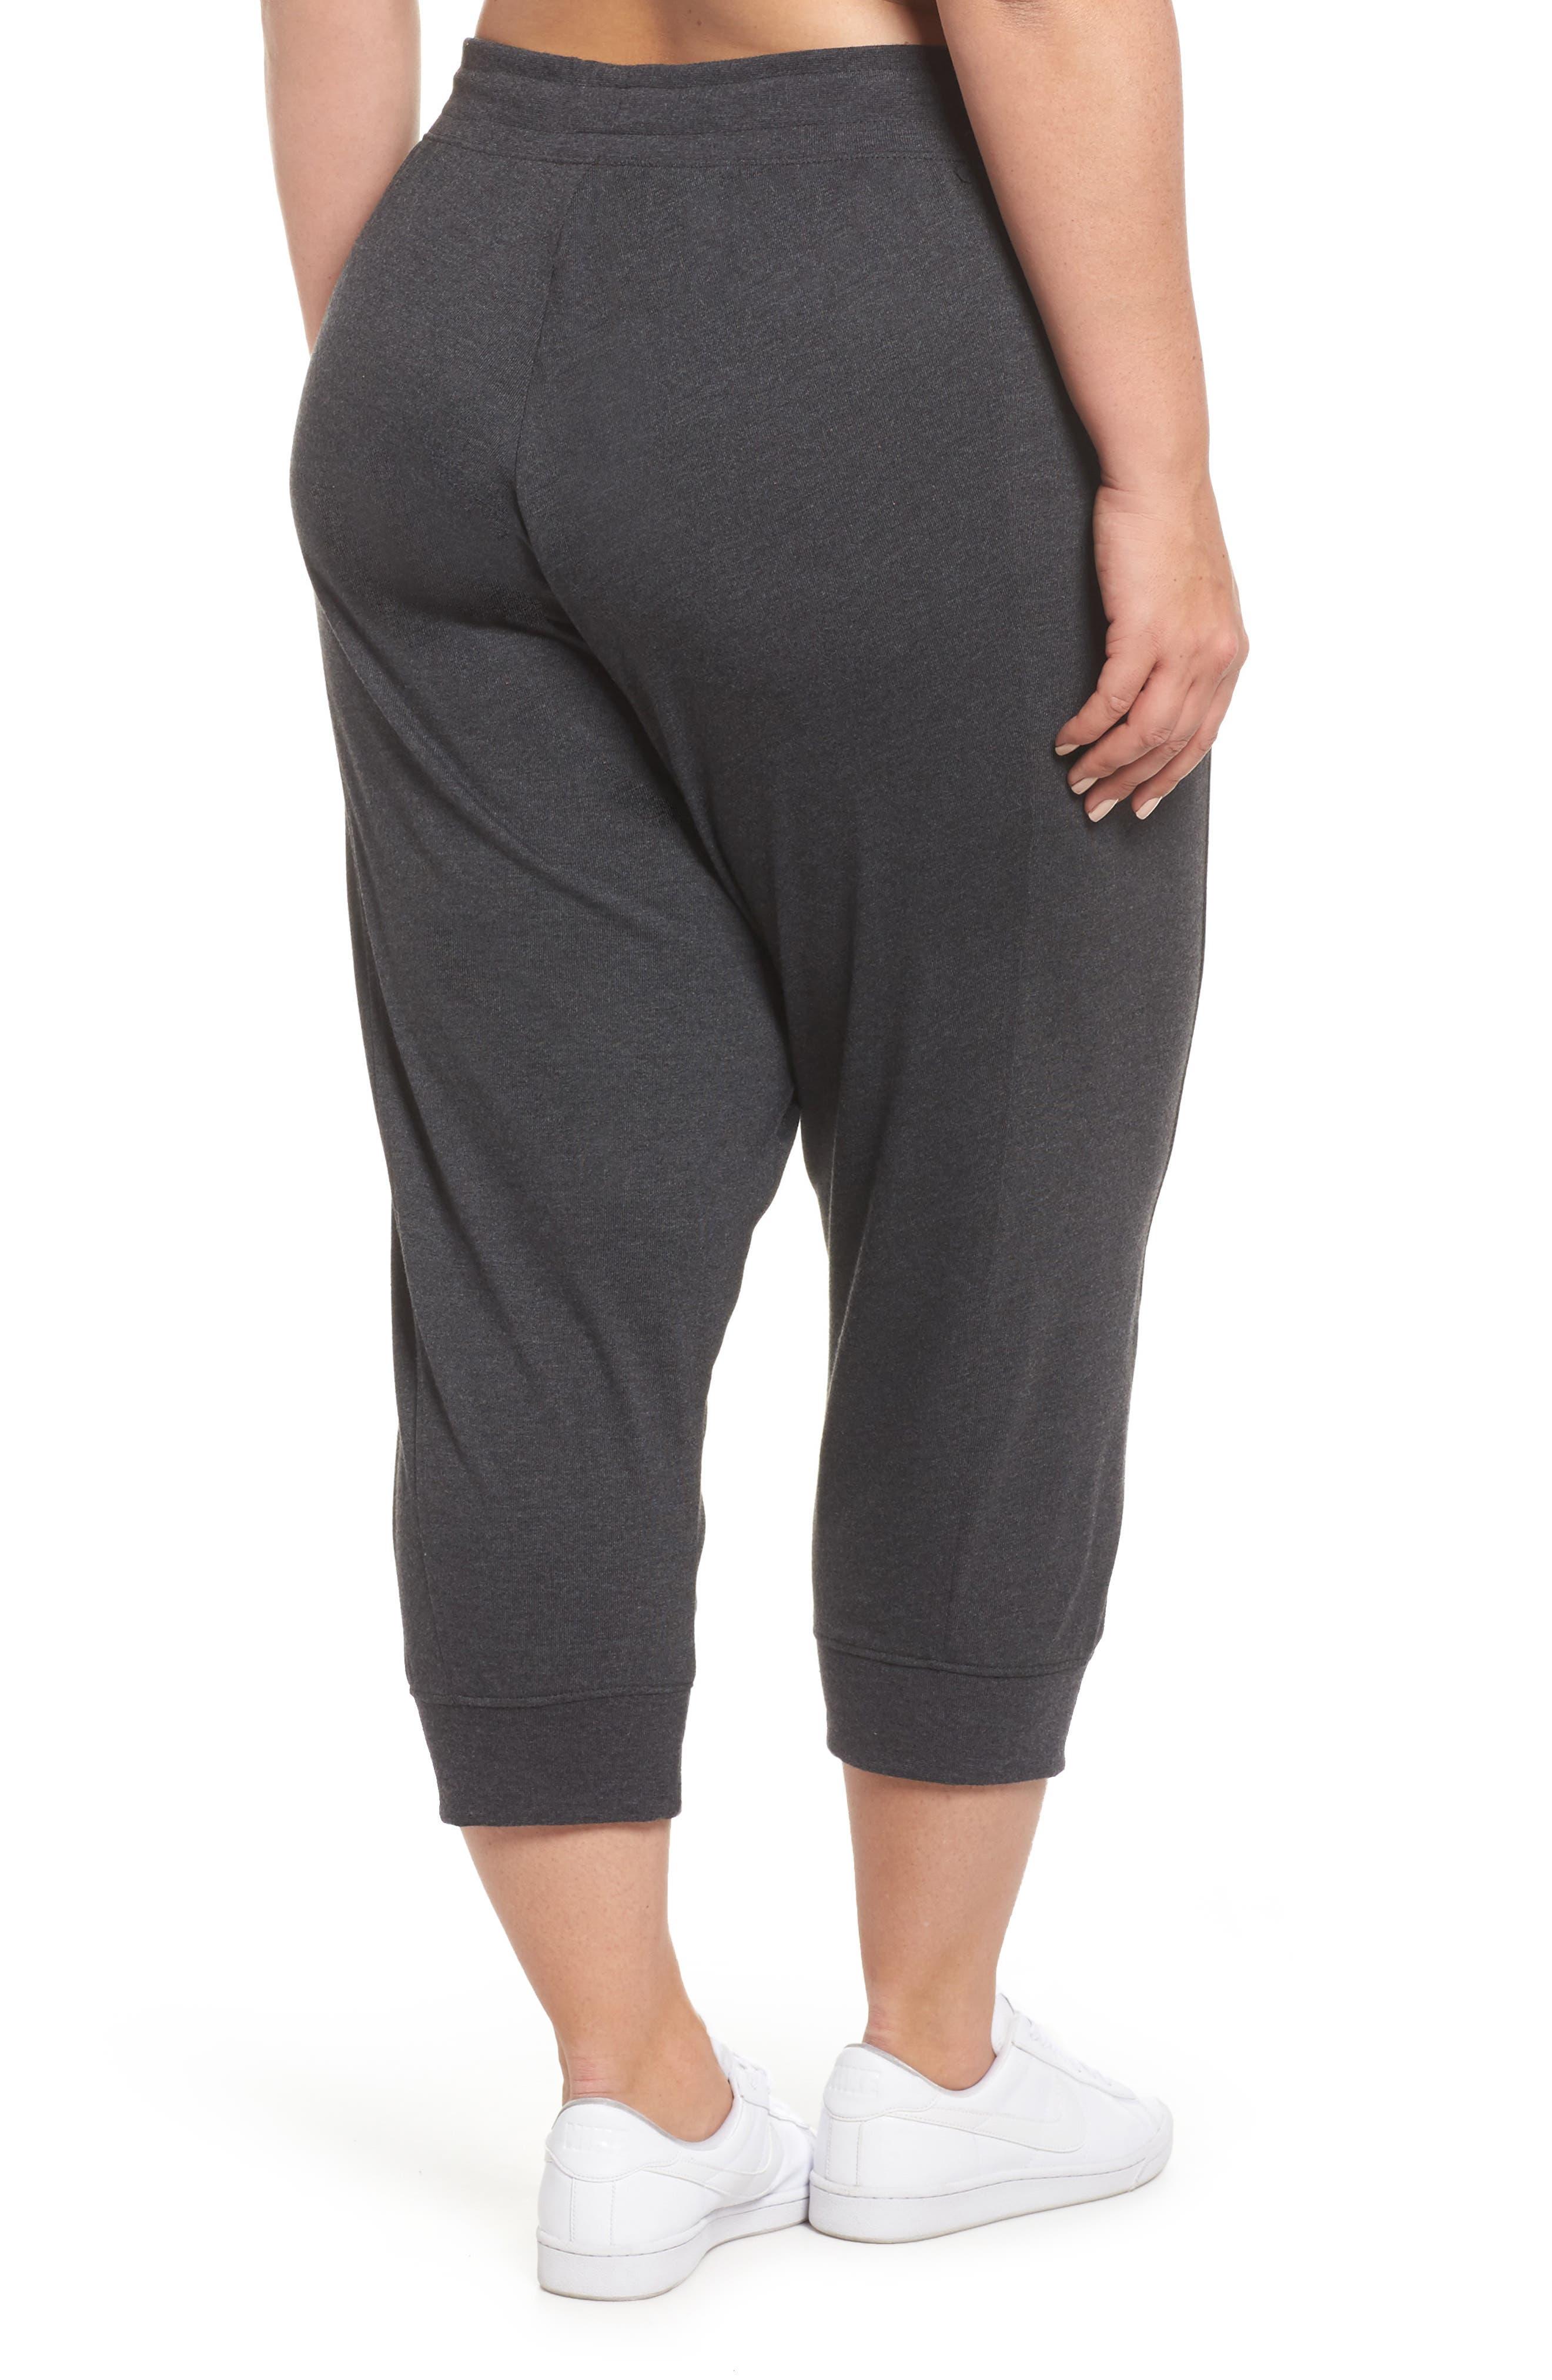 Sportswear Gym Capris,                             Alternate thumbnail 2, color,                             Black Heather/ Sail